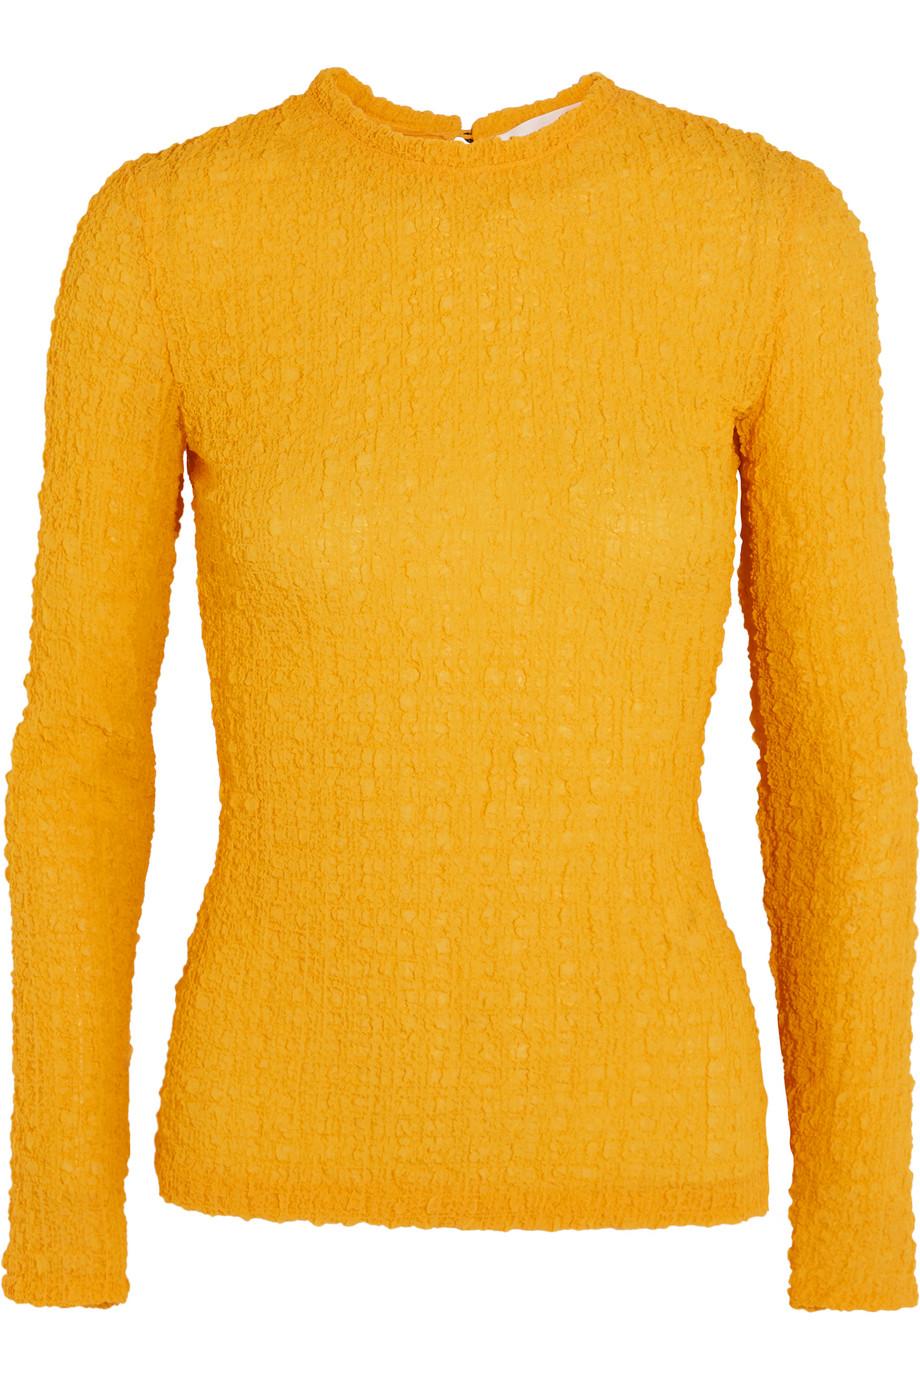 Victoria Beckham Silk-Seersucker Top, Yellow, Women's, Size: 12